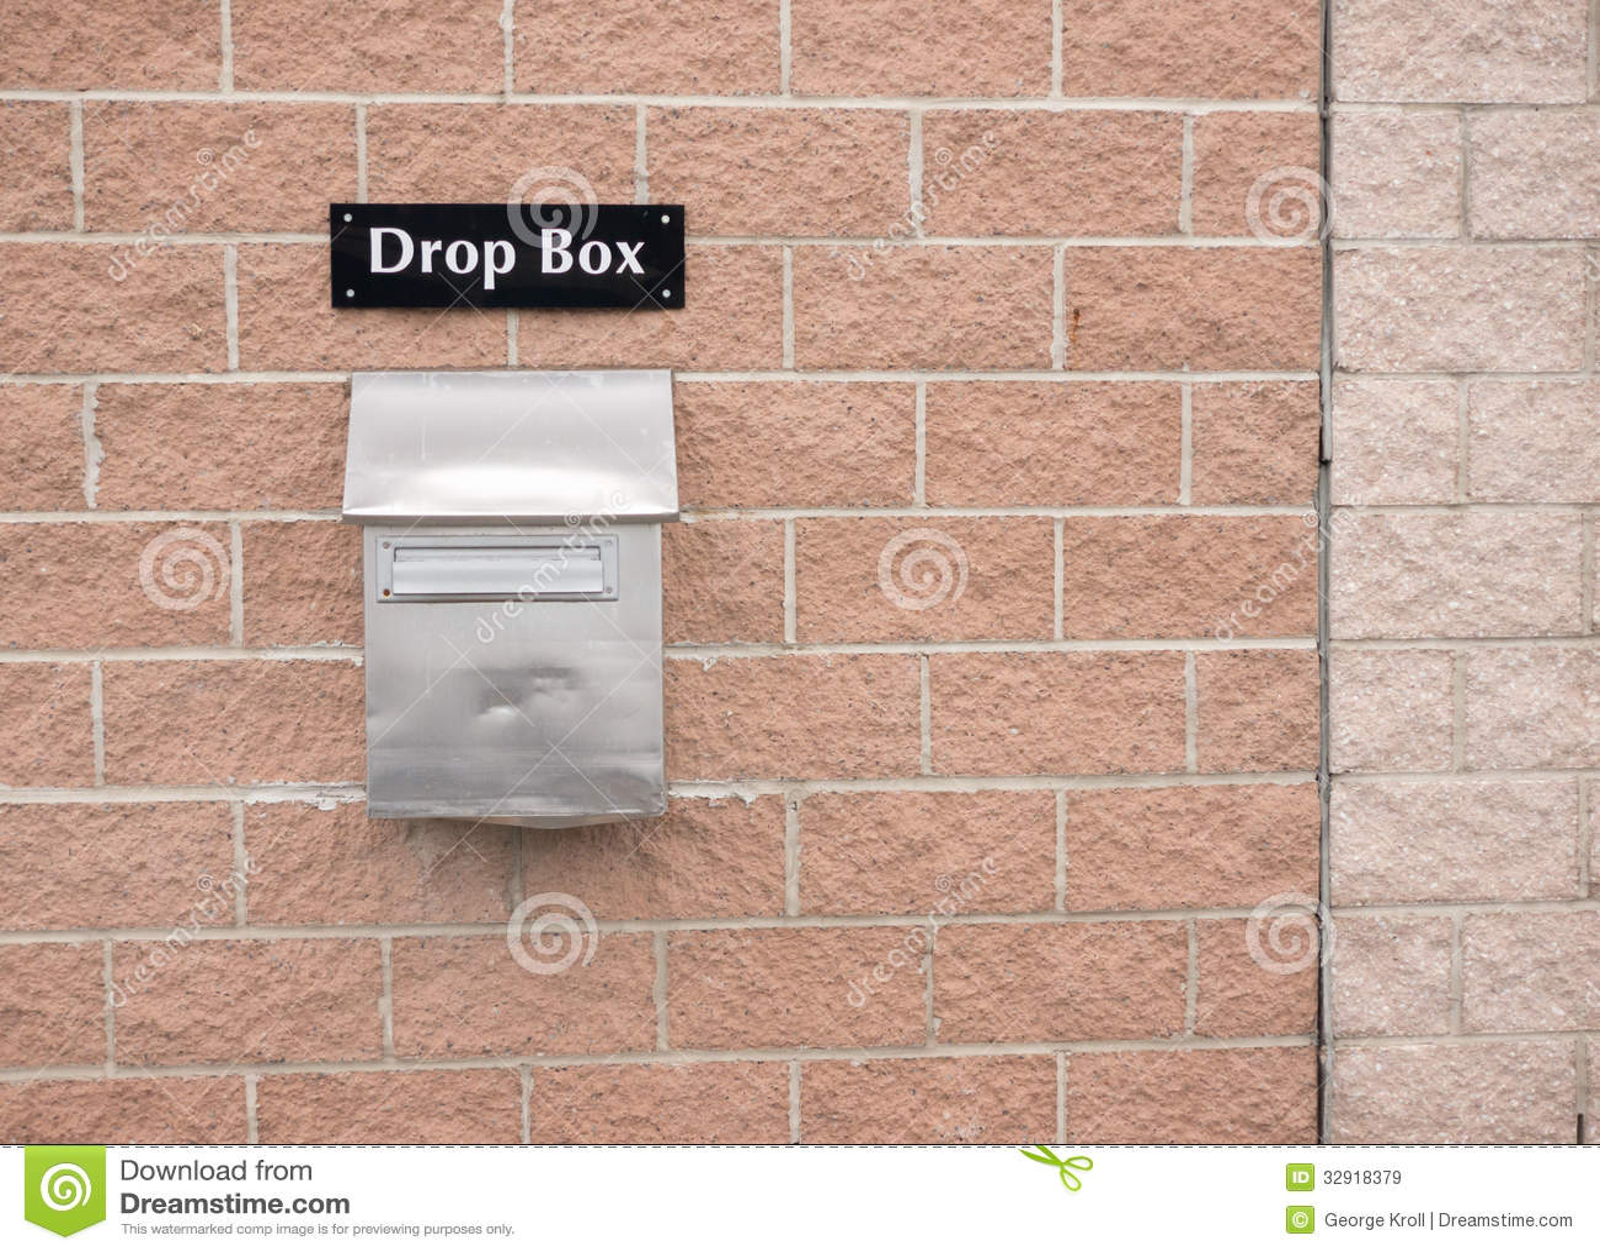 Drop Box Royalty Free Stock Images - Image: 32918379